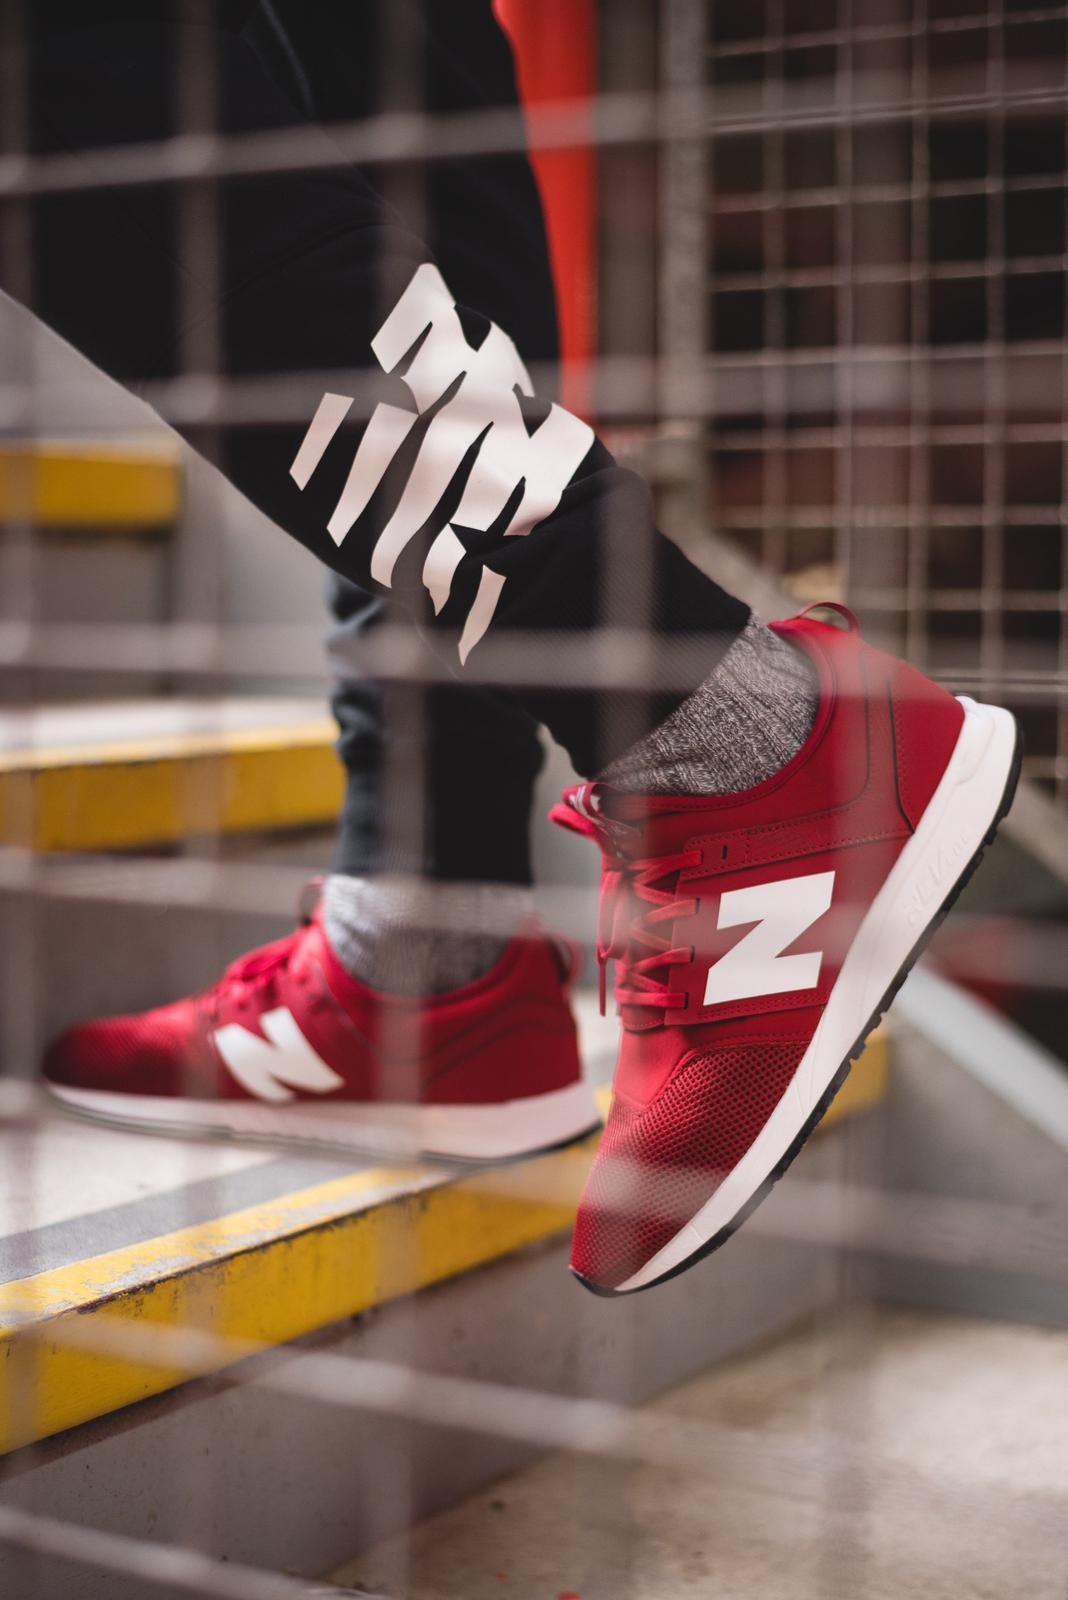 new balance liverpool shoes 247